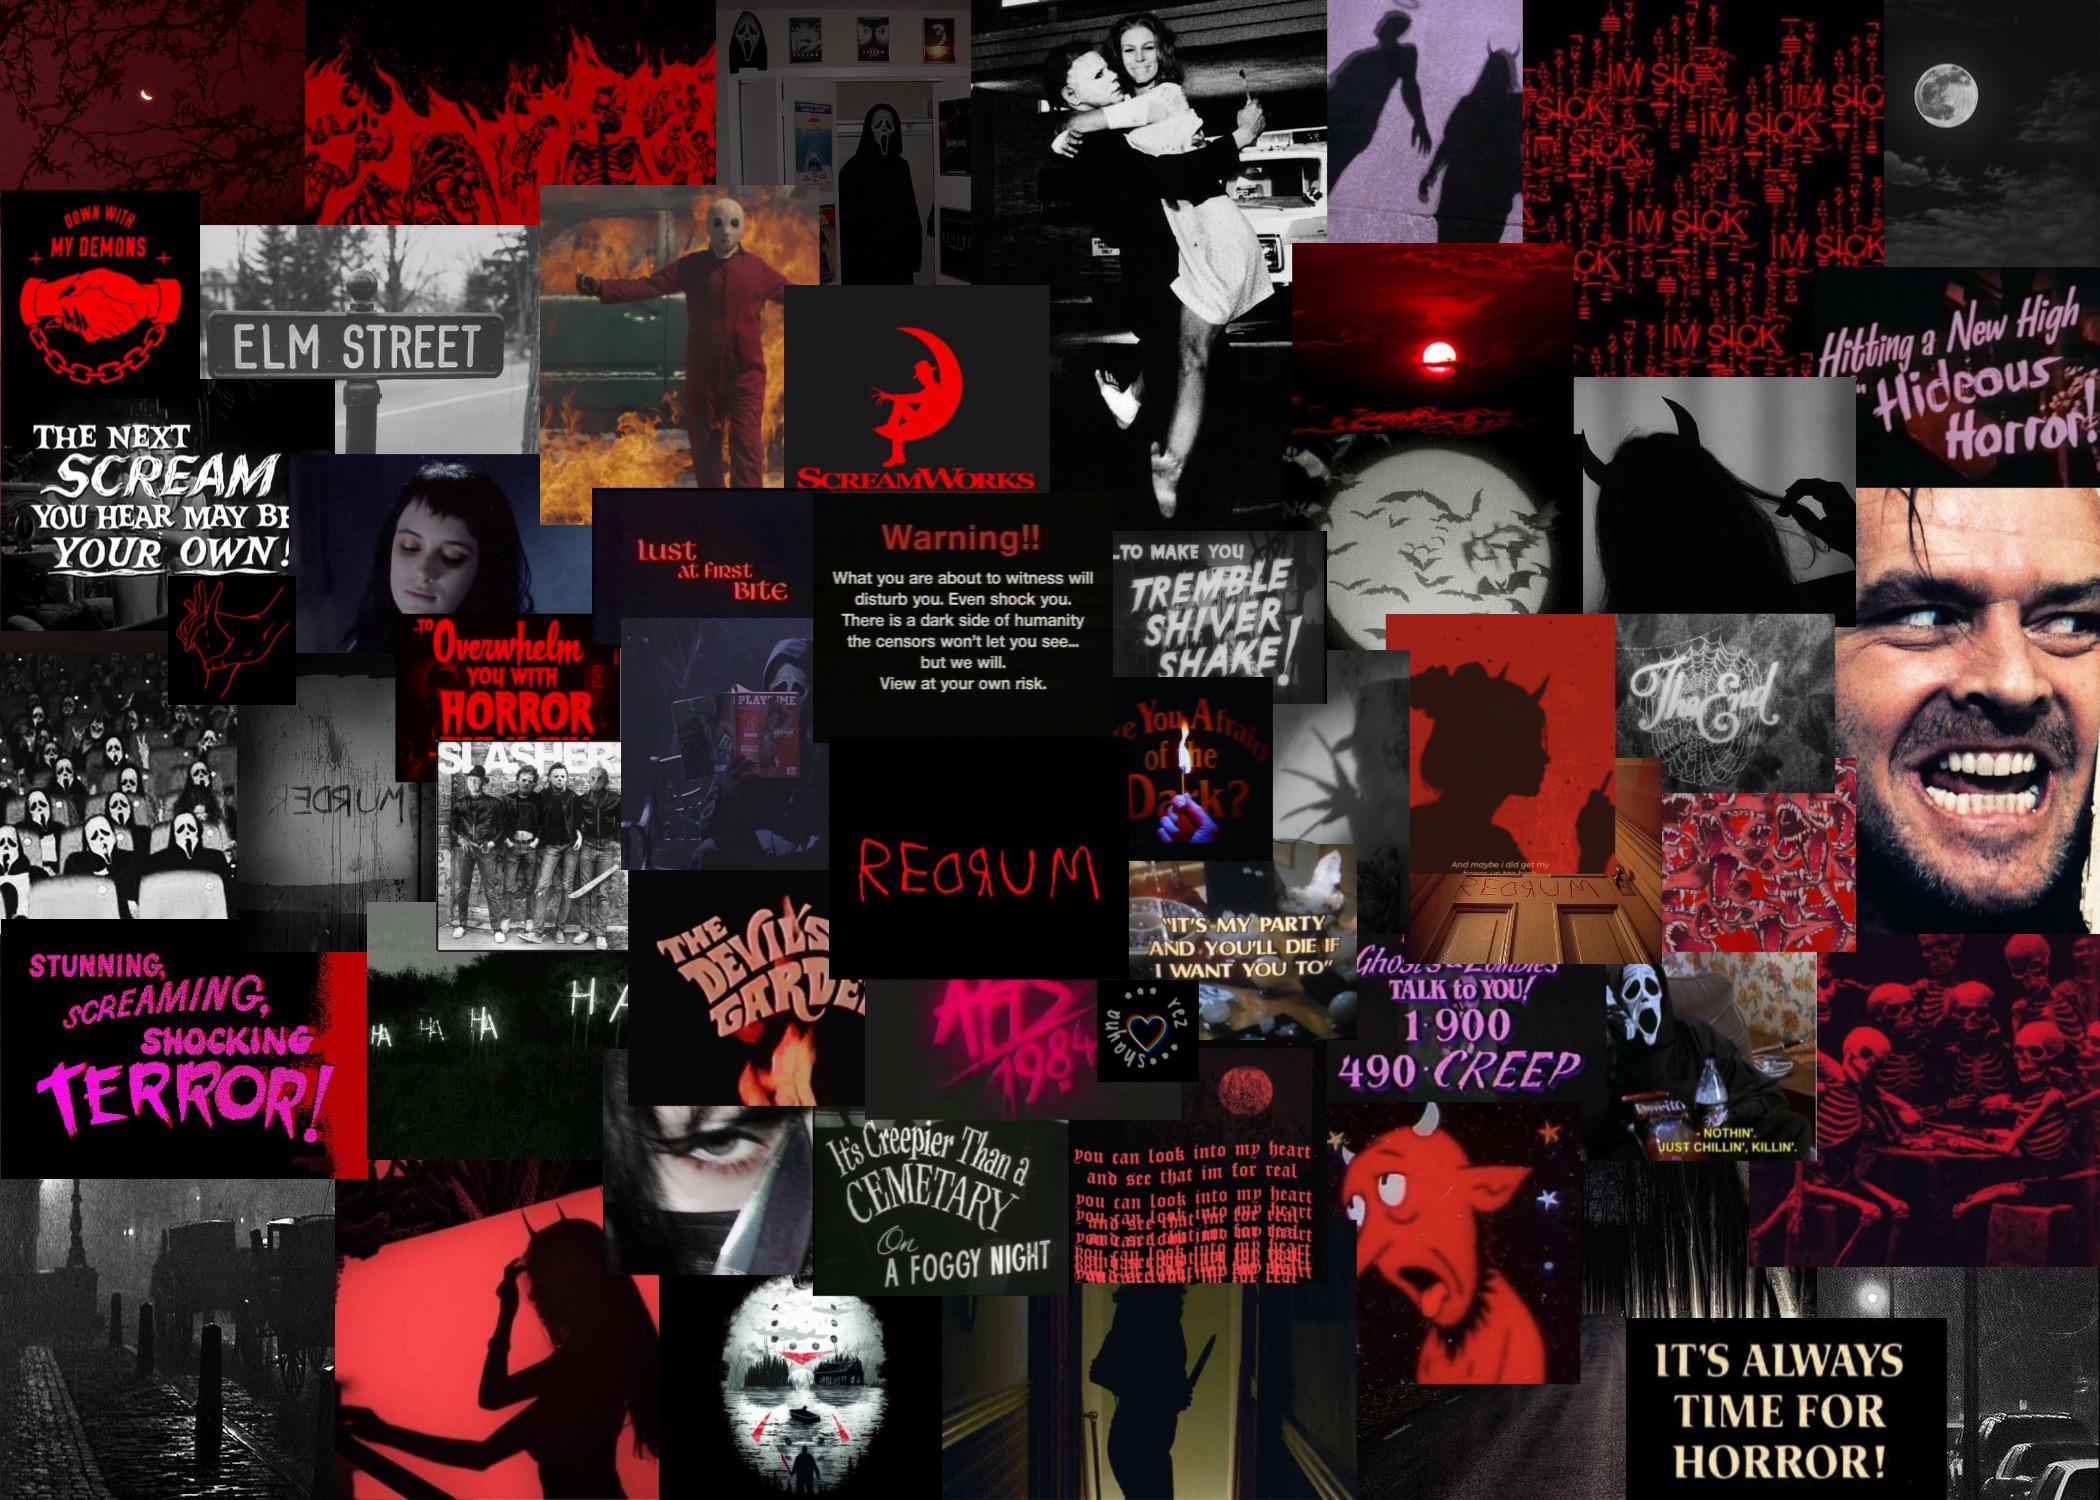 Horror Aesthetic Laptop Wallpaper In 2020 Halloween Wallpaper Iphone Laptop Wallpaper Cute Desktop Wallpaper